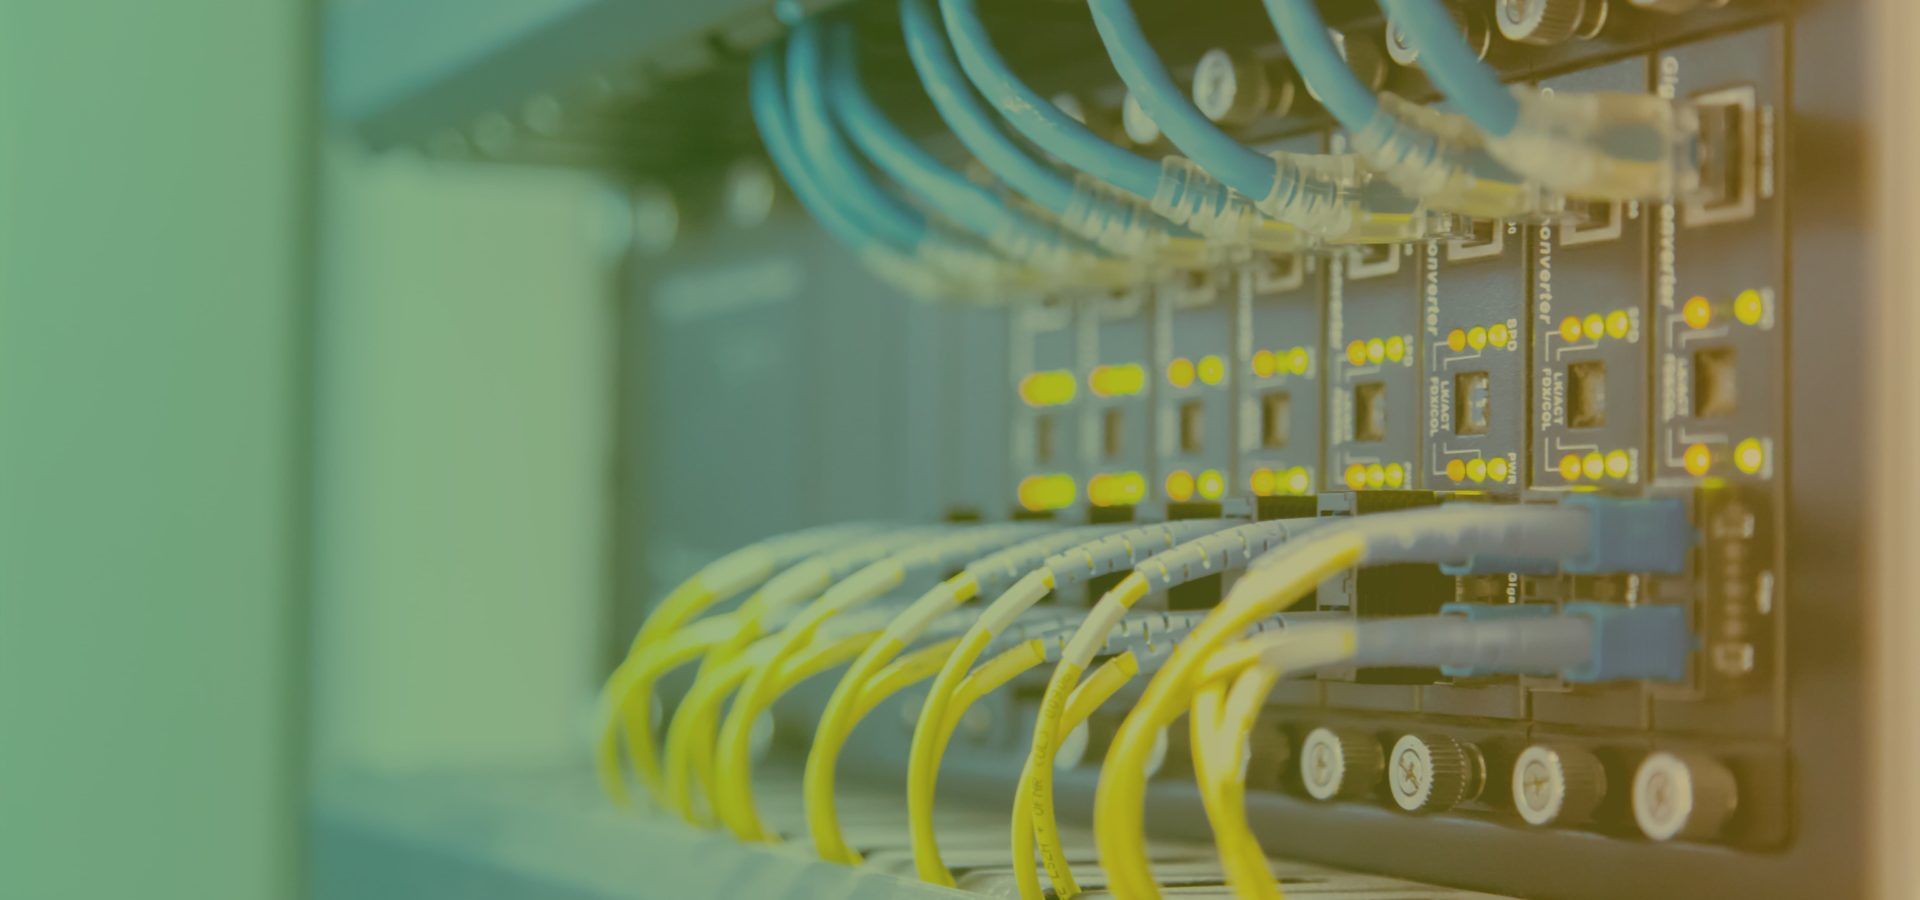 fiber networking